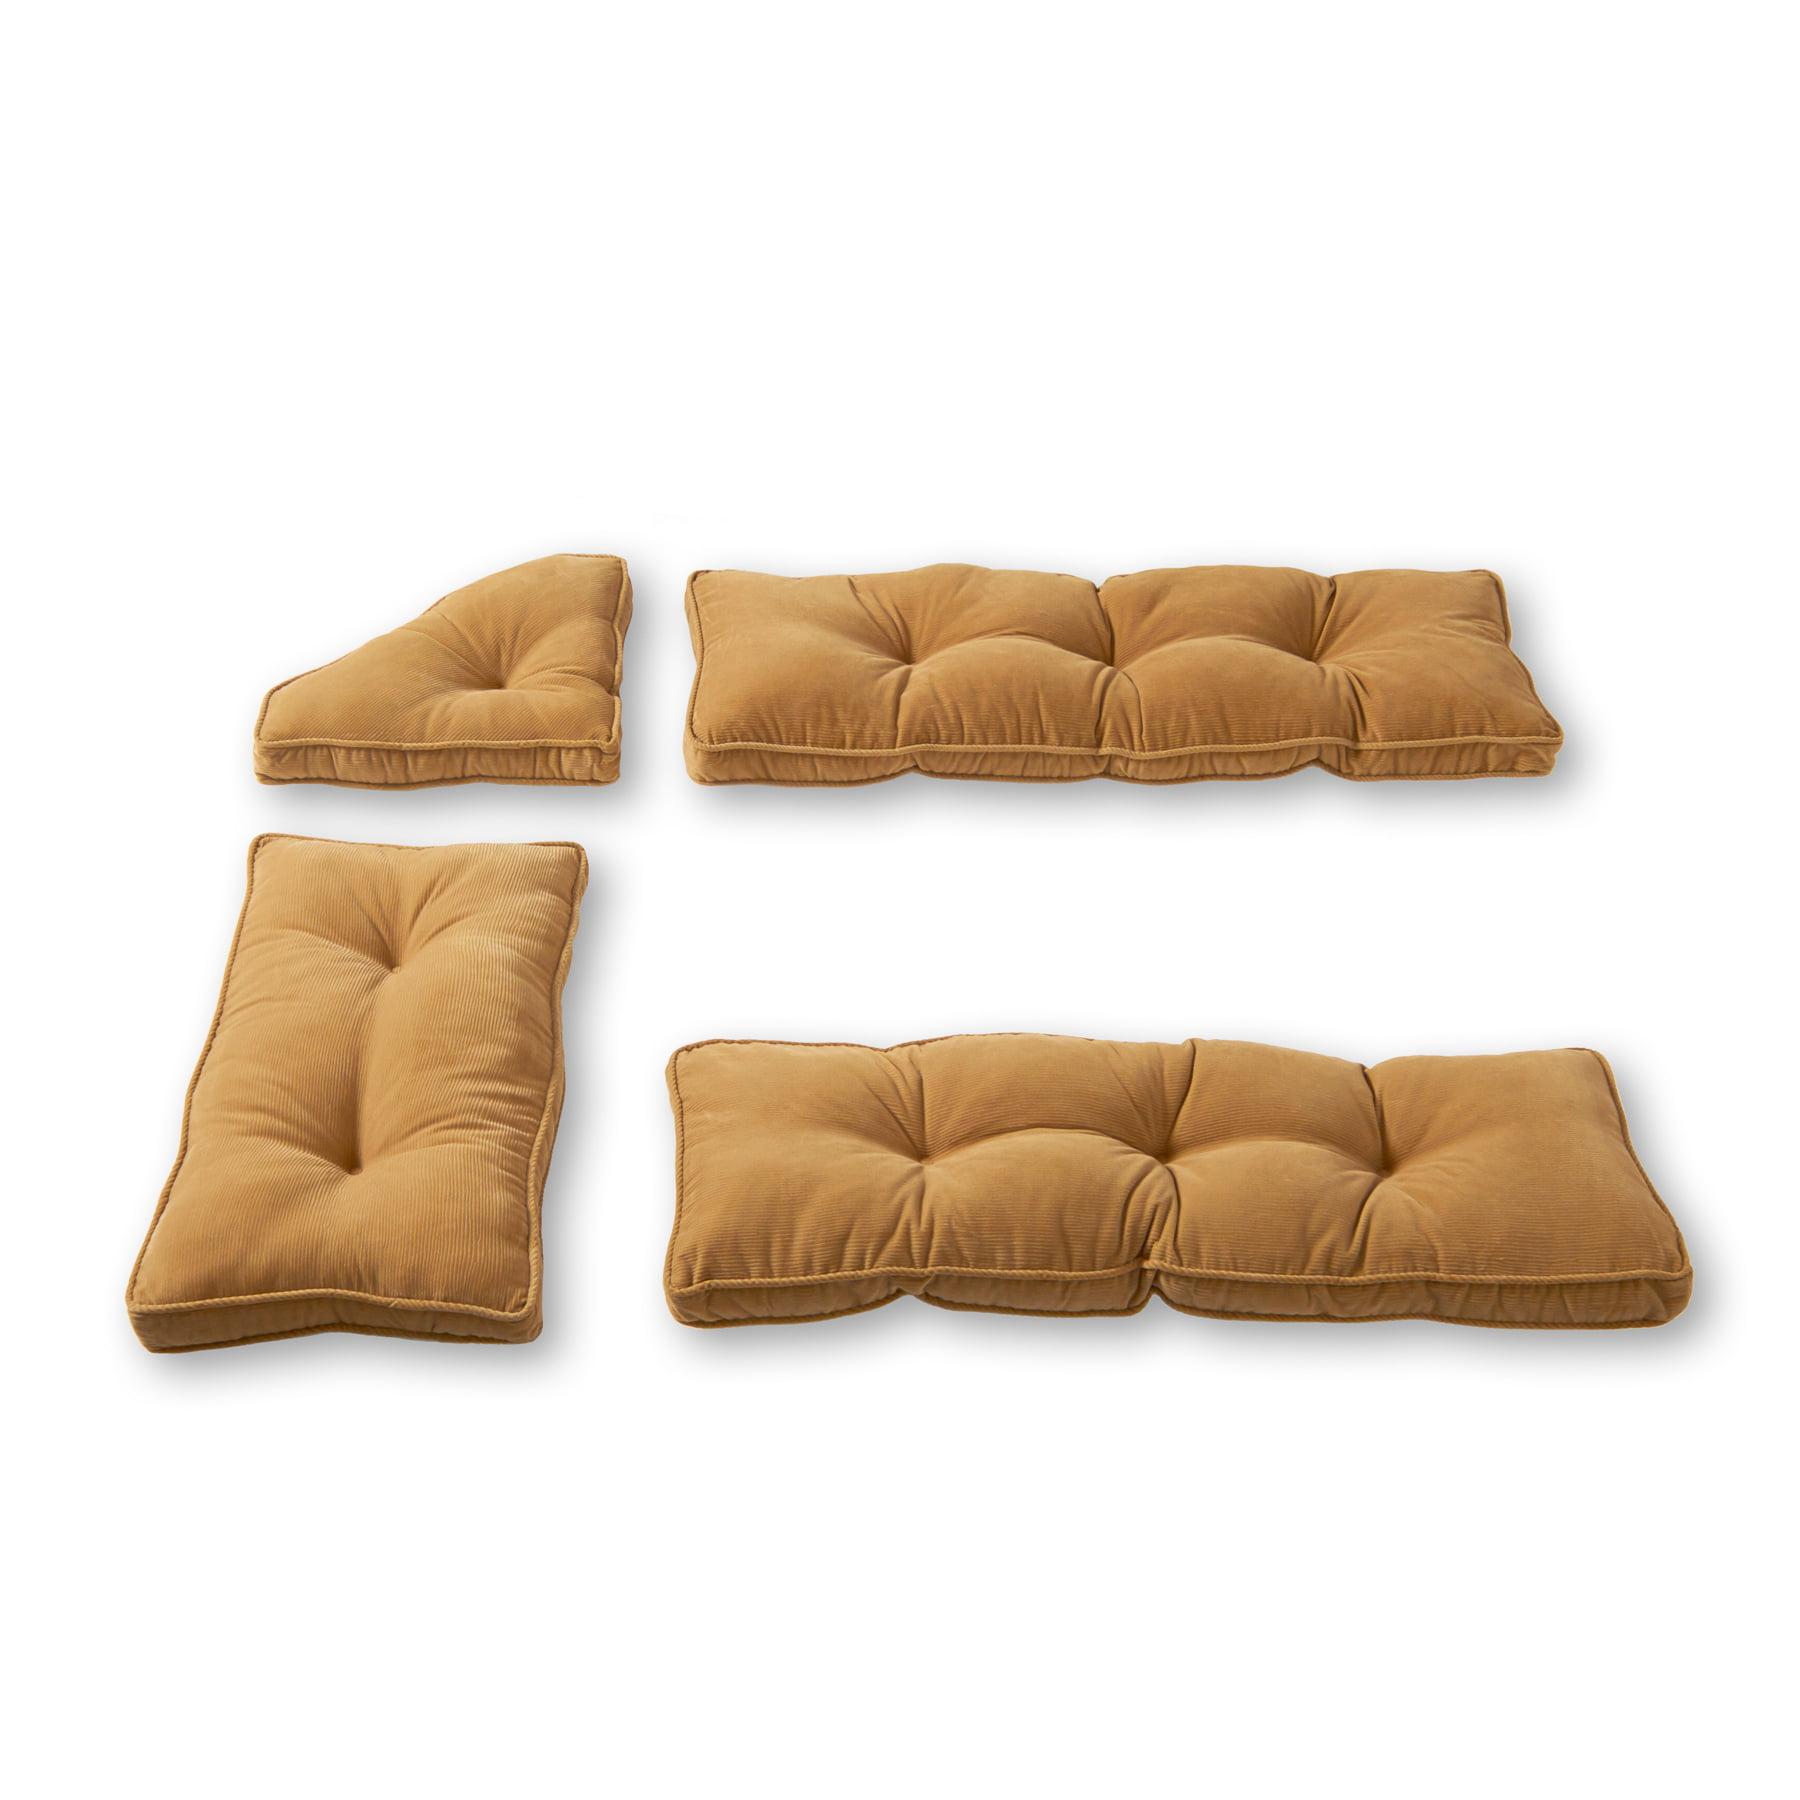 Greendale Home Fashions Cherokee 4-Piece Nook Cushion Set by Greendale Home Fashions